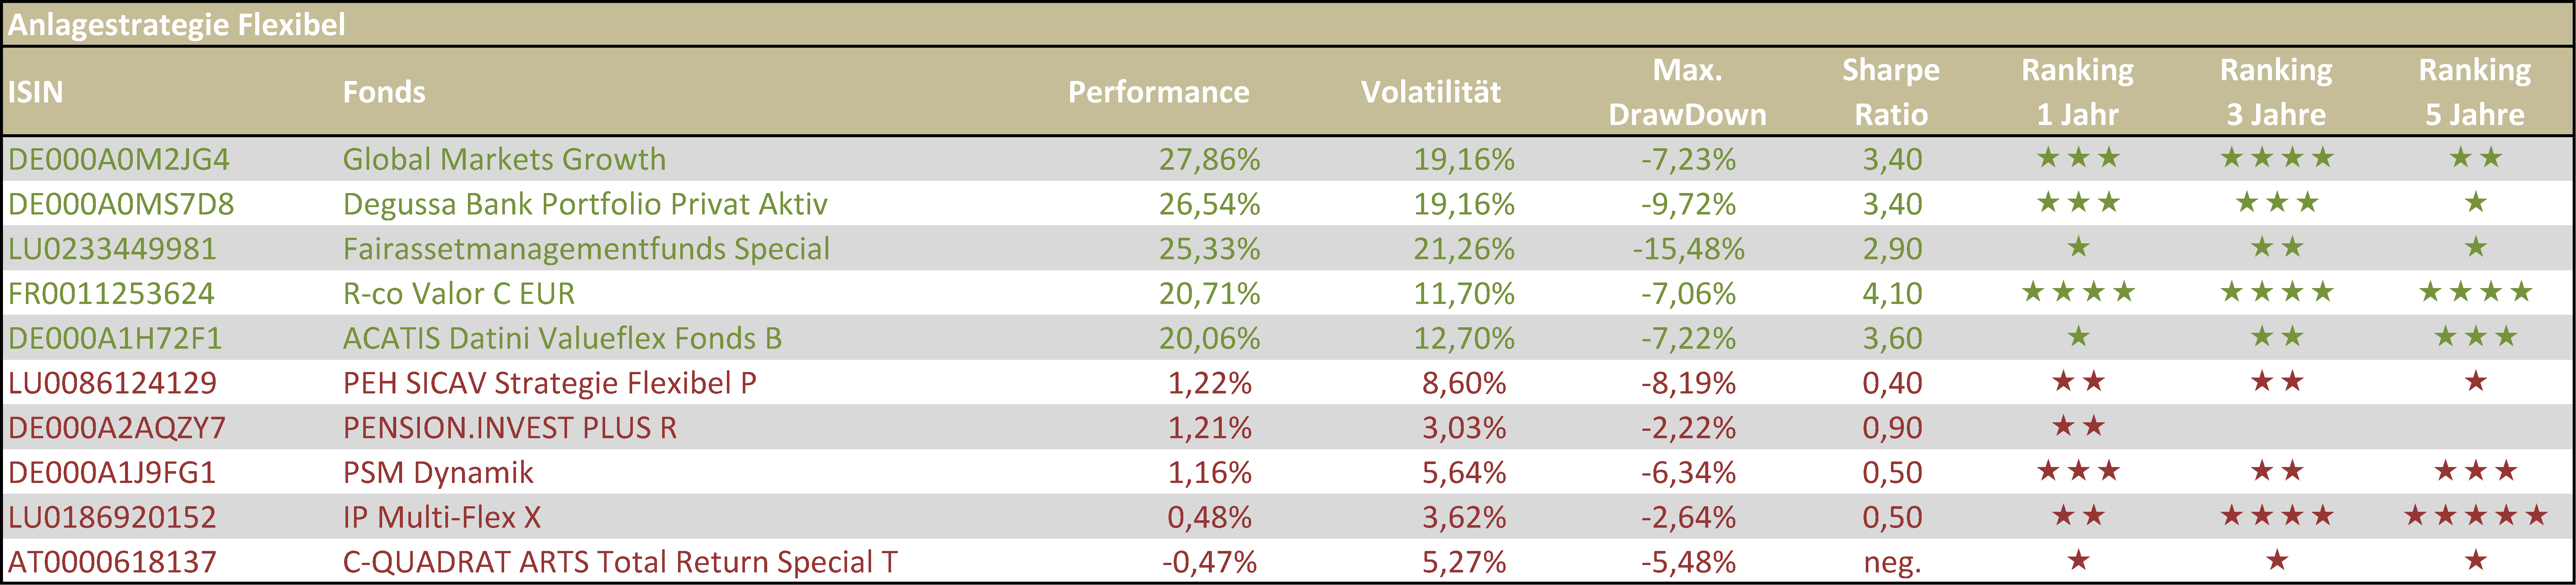 Tabelle 4 - Beste und schlechteste flexible VV-Fonds HJ 1 2019